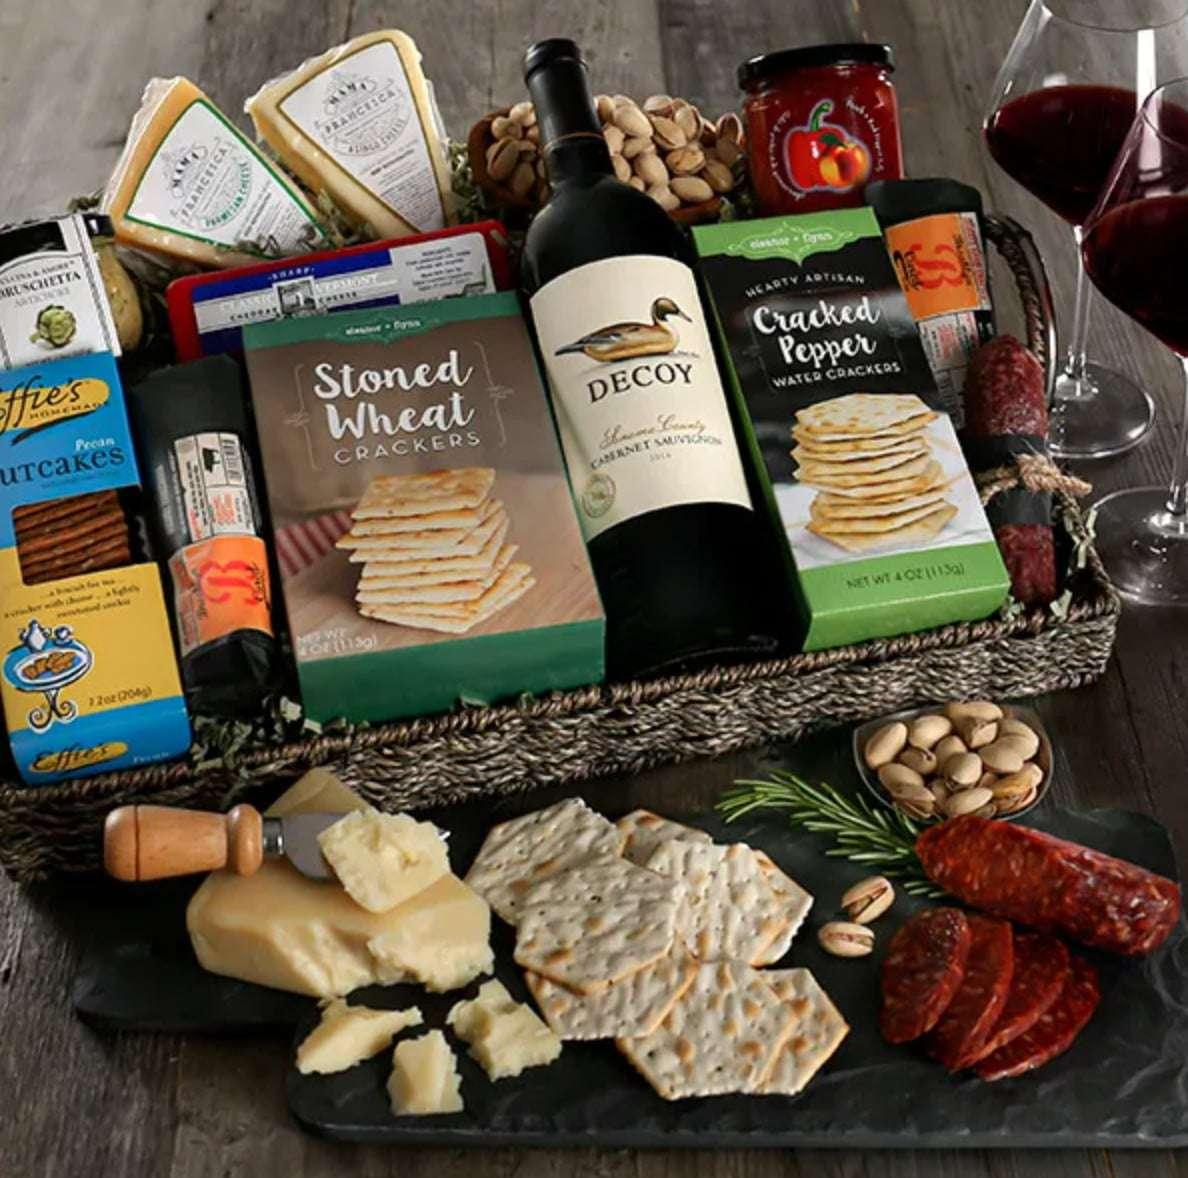 gourmet-gift-baskets-artisan-charcuterie-wine-tray